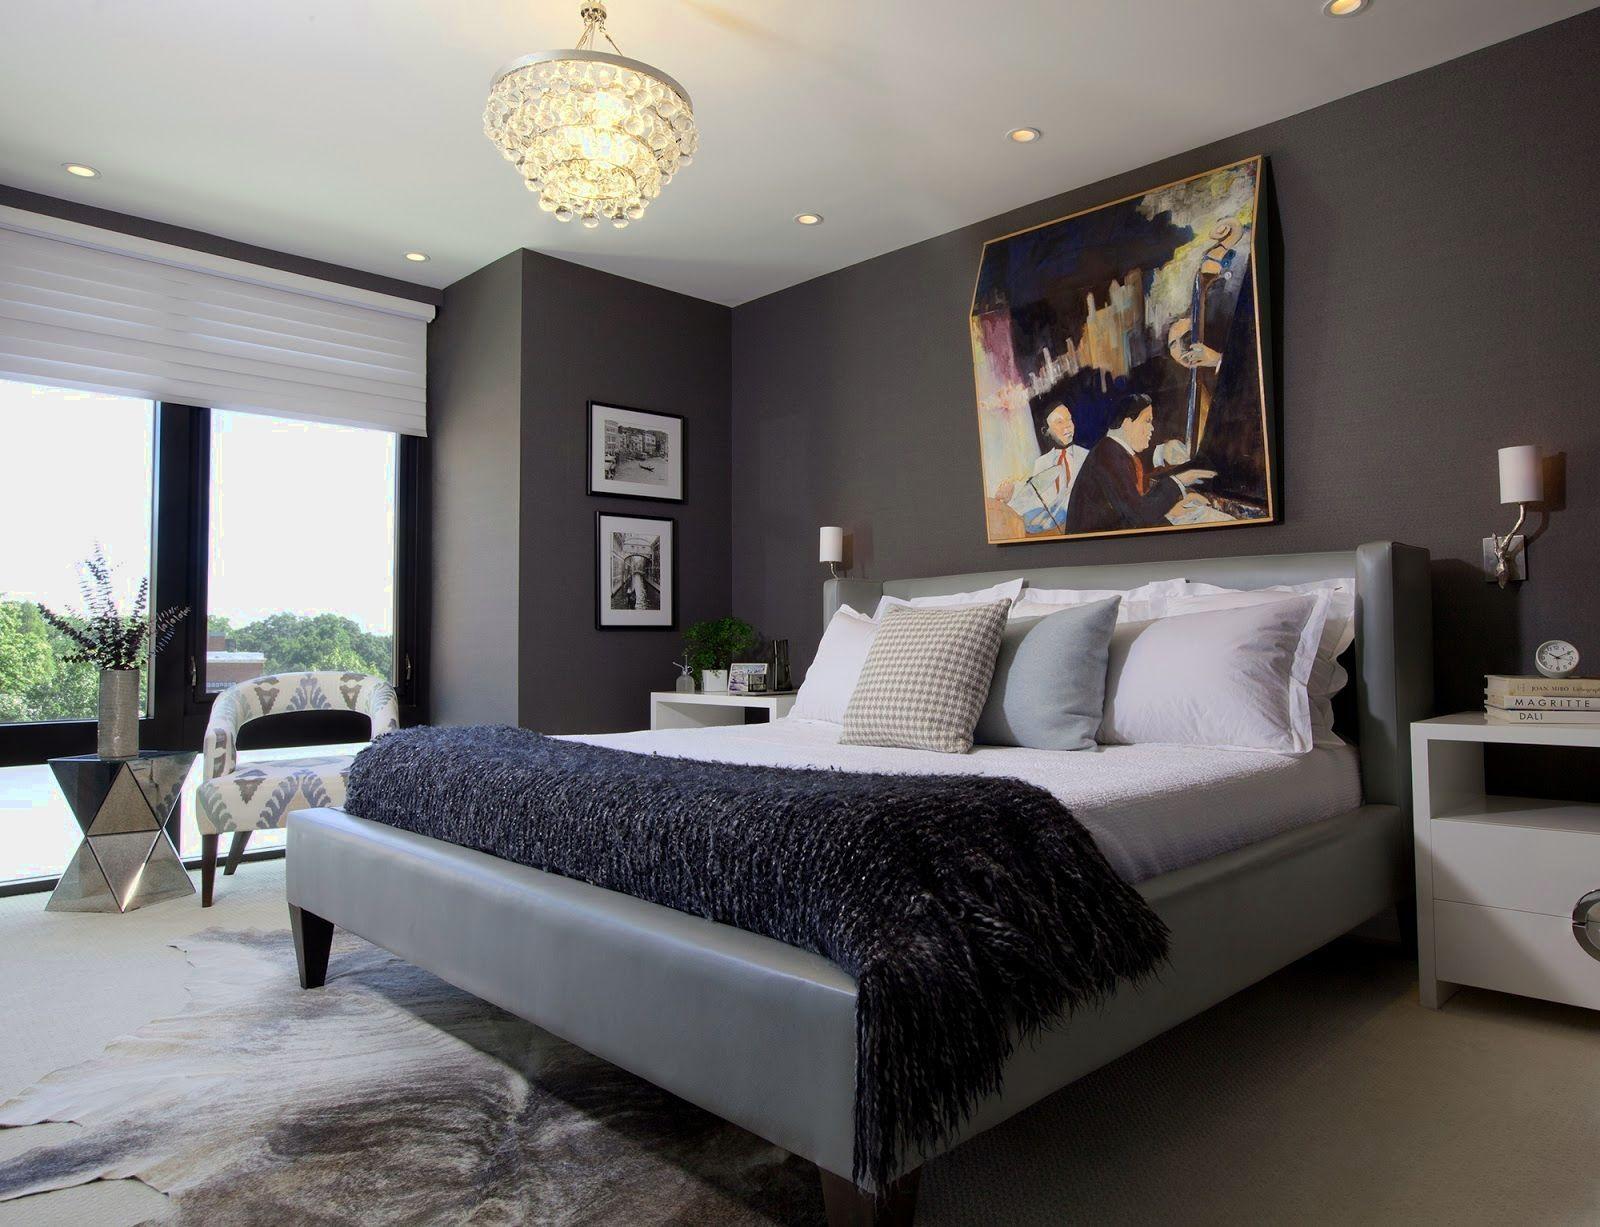 Wall Decor For Mens Bedroom – Thelakehouseva In Wall Art For Mens Bedroom (View 4 of 20)